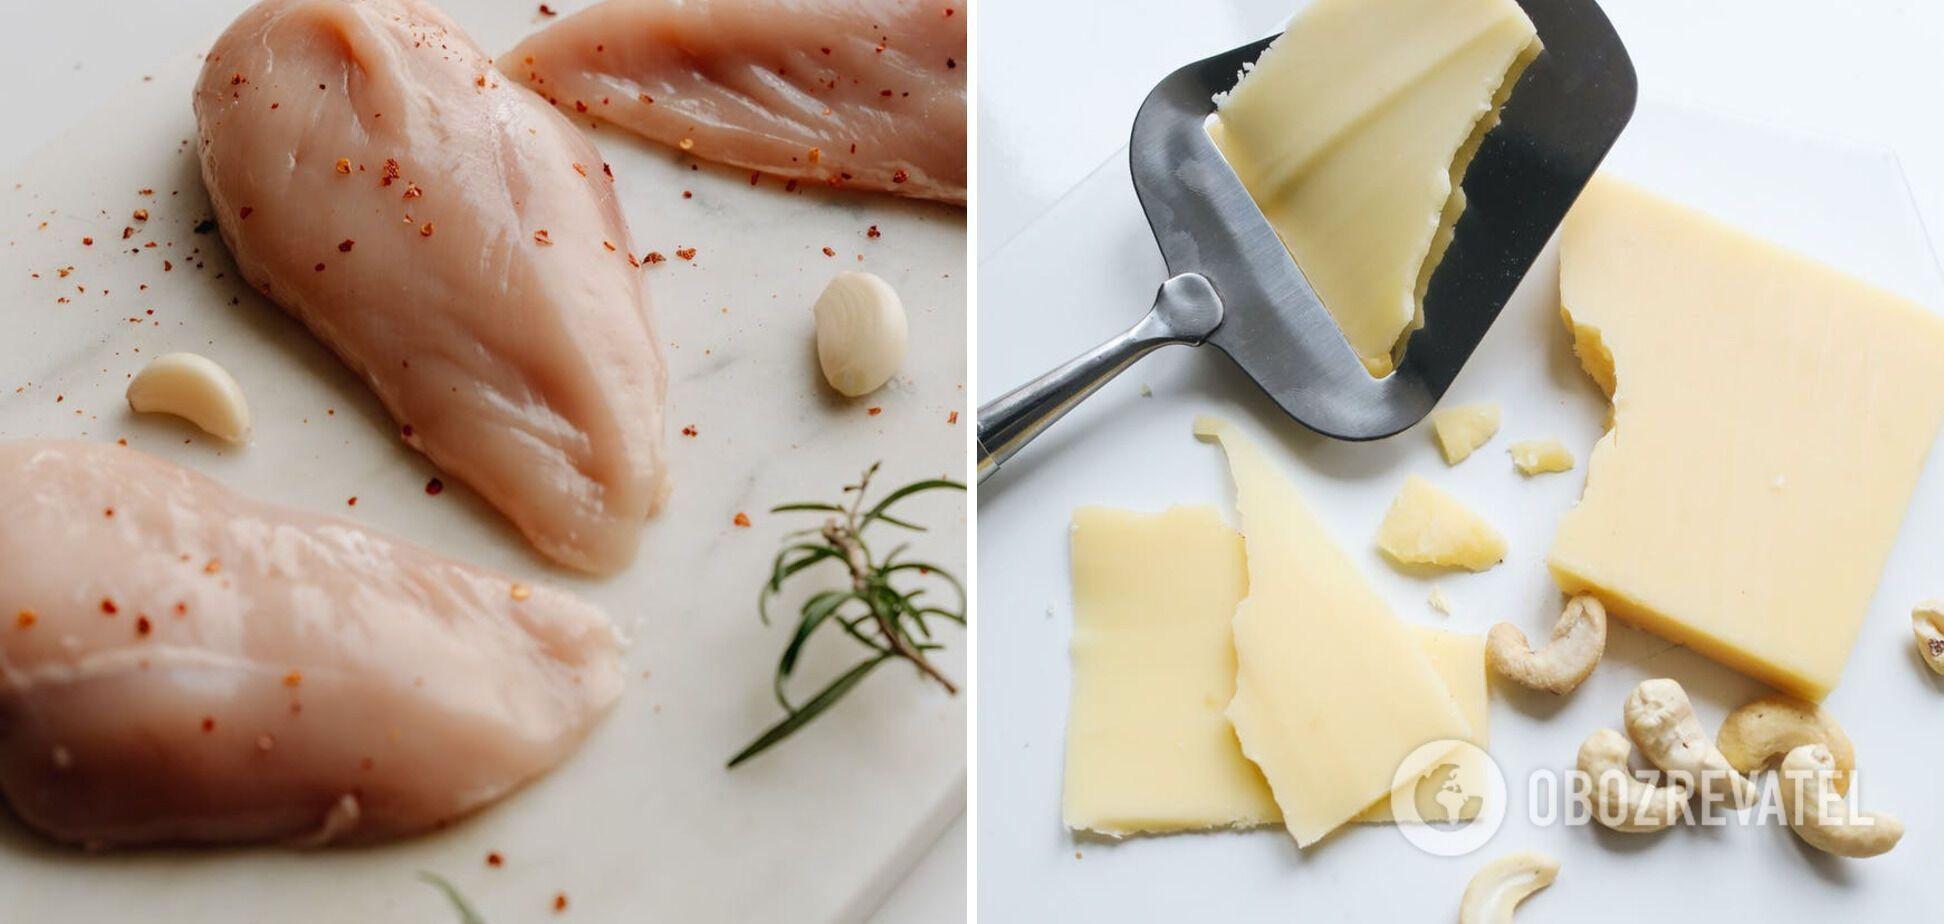 Ингредиенты для салата: сыр, курица и орехи